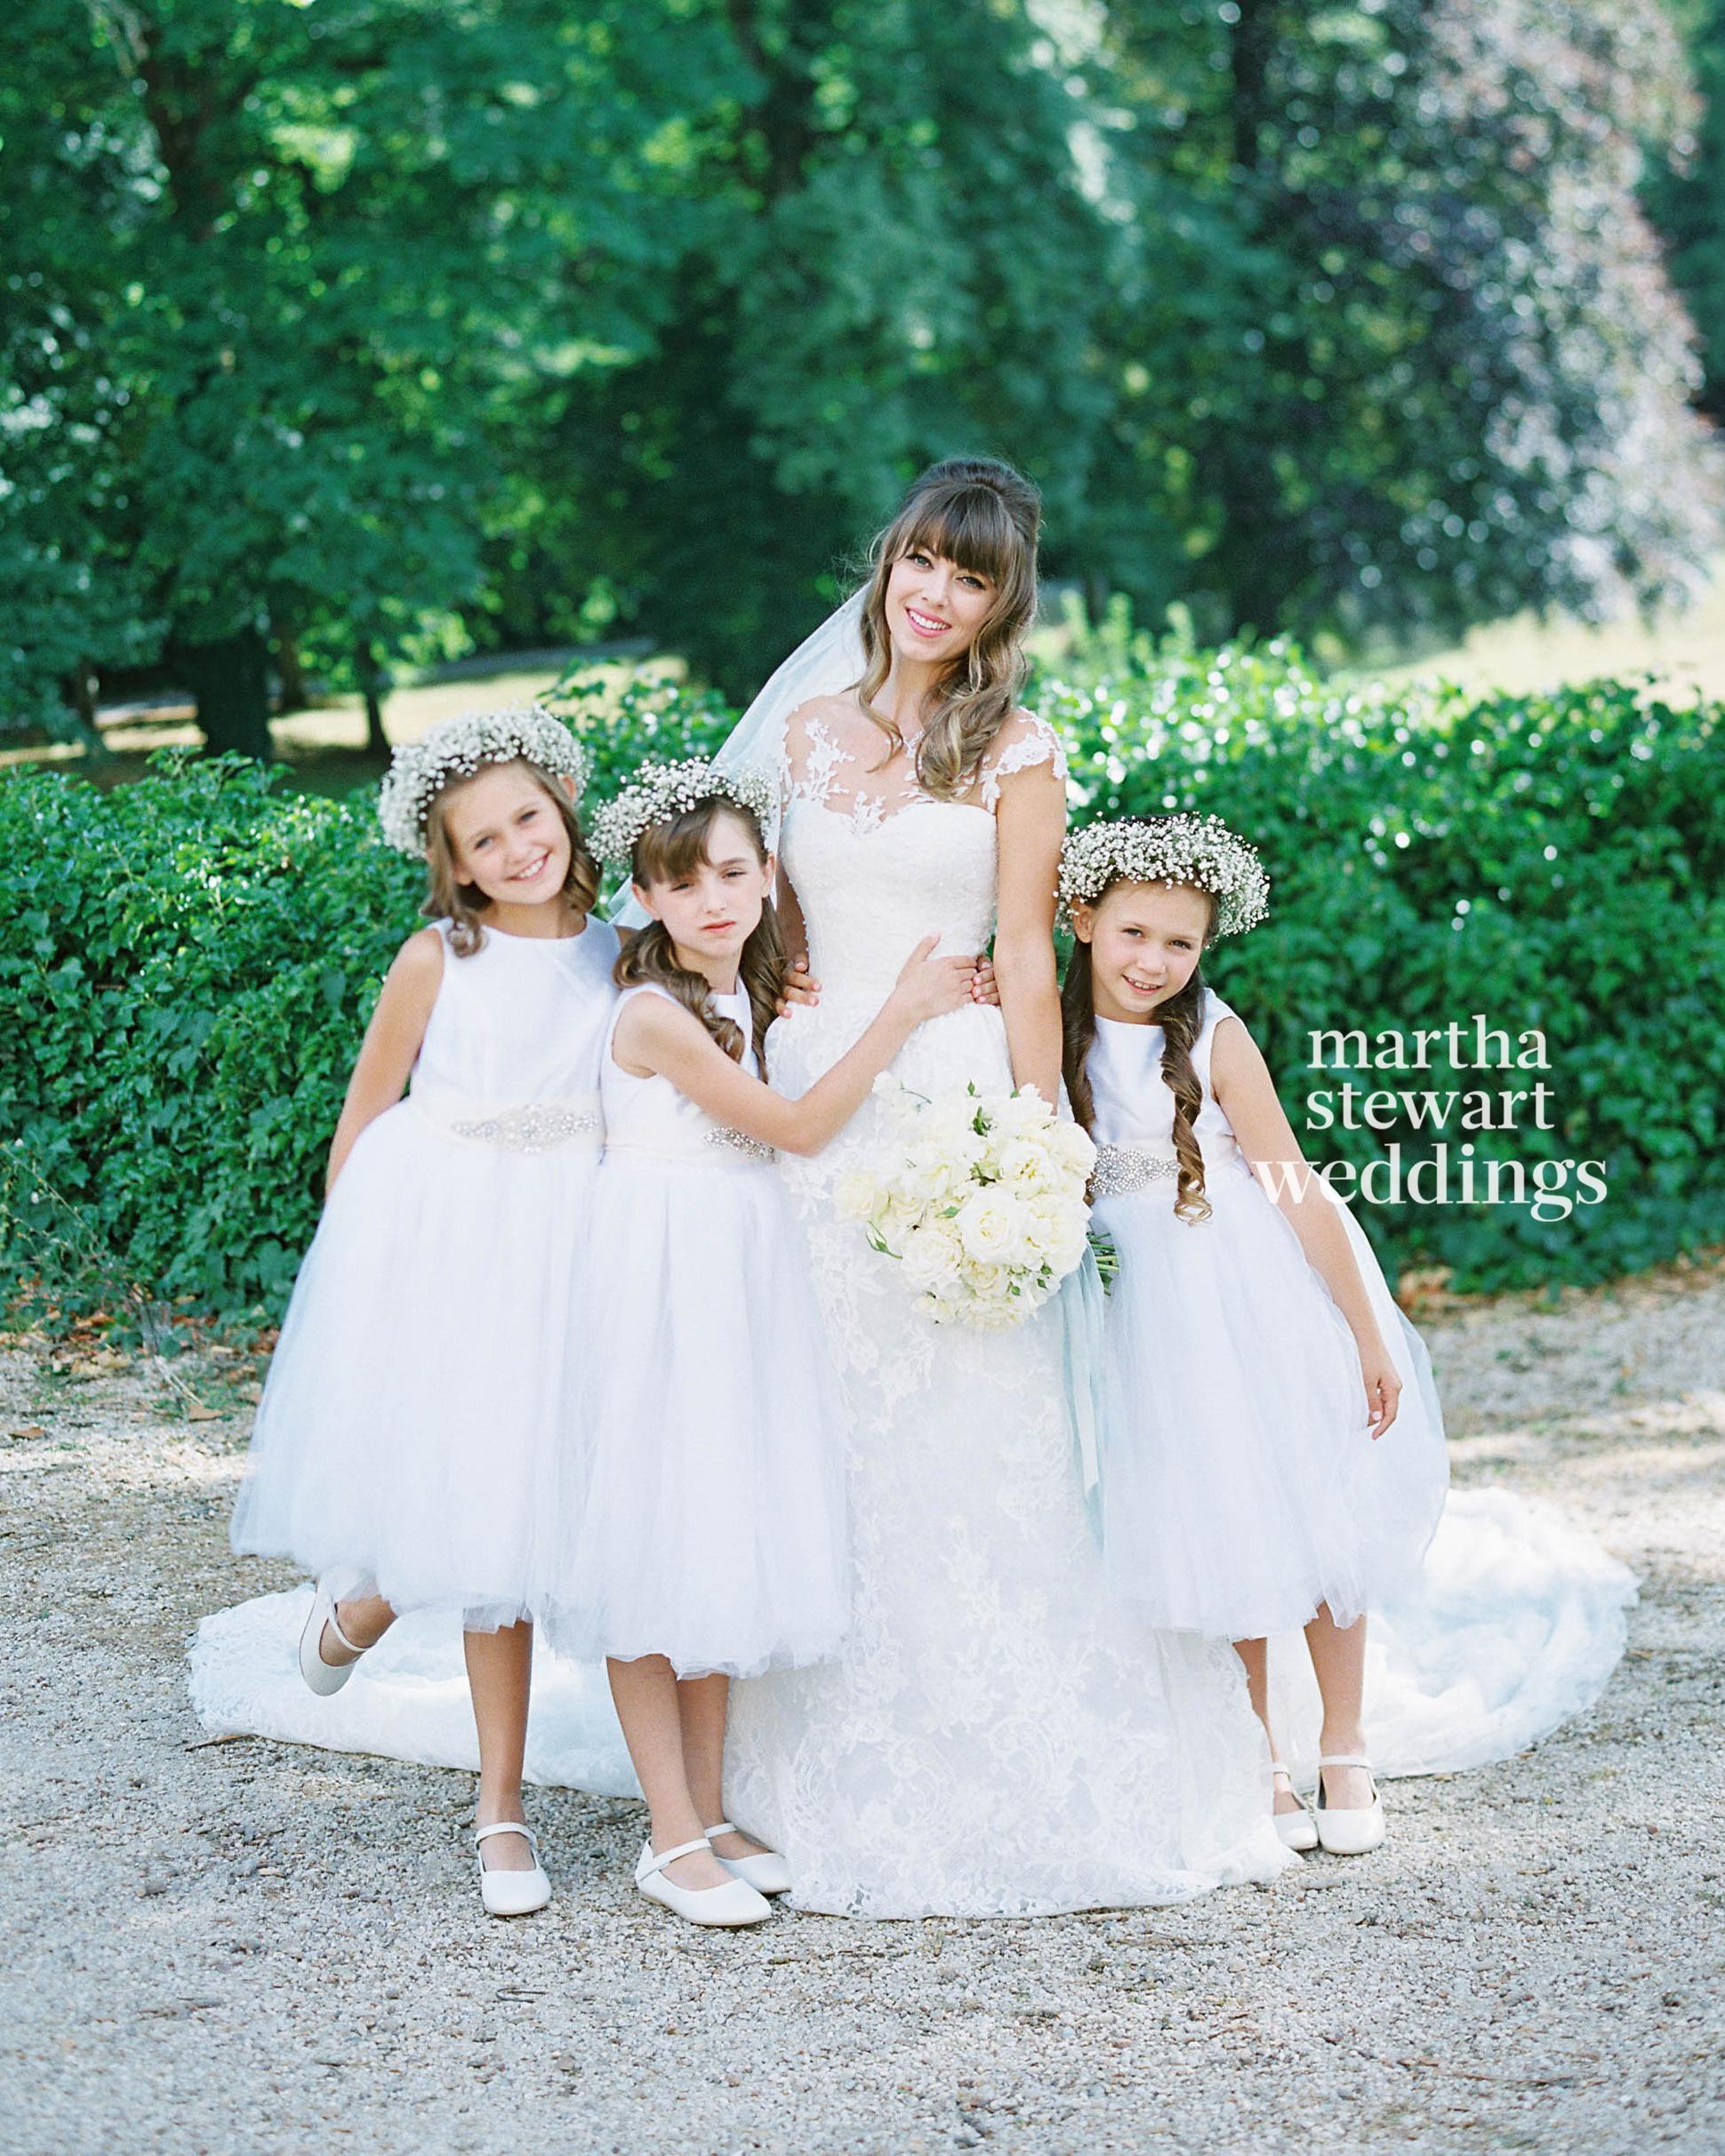 jenny-freddie-wedding-france-550-d112242-watermarked-1215.jpg